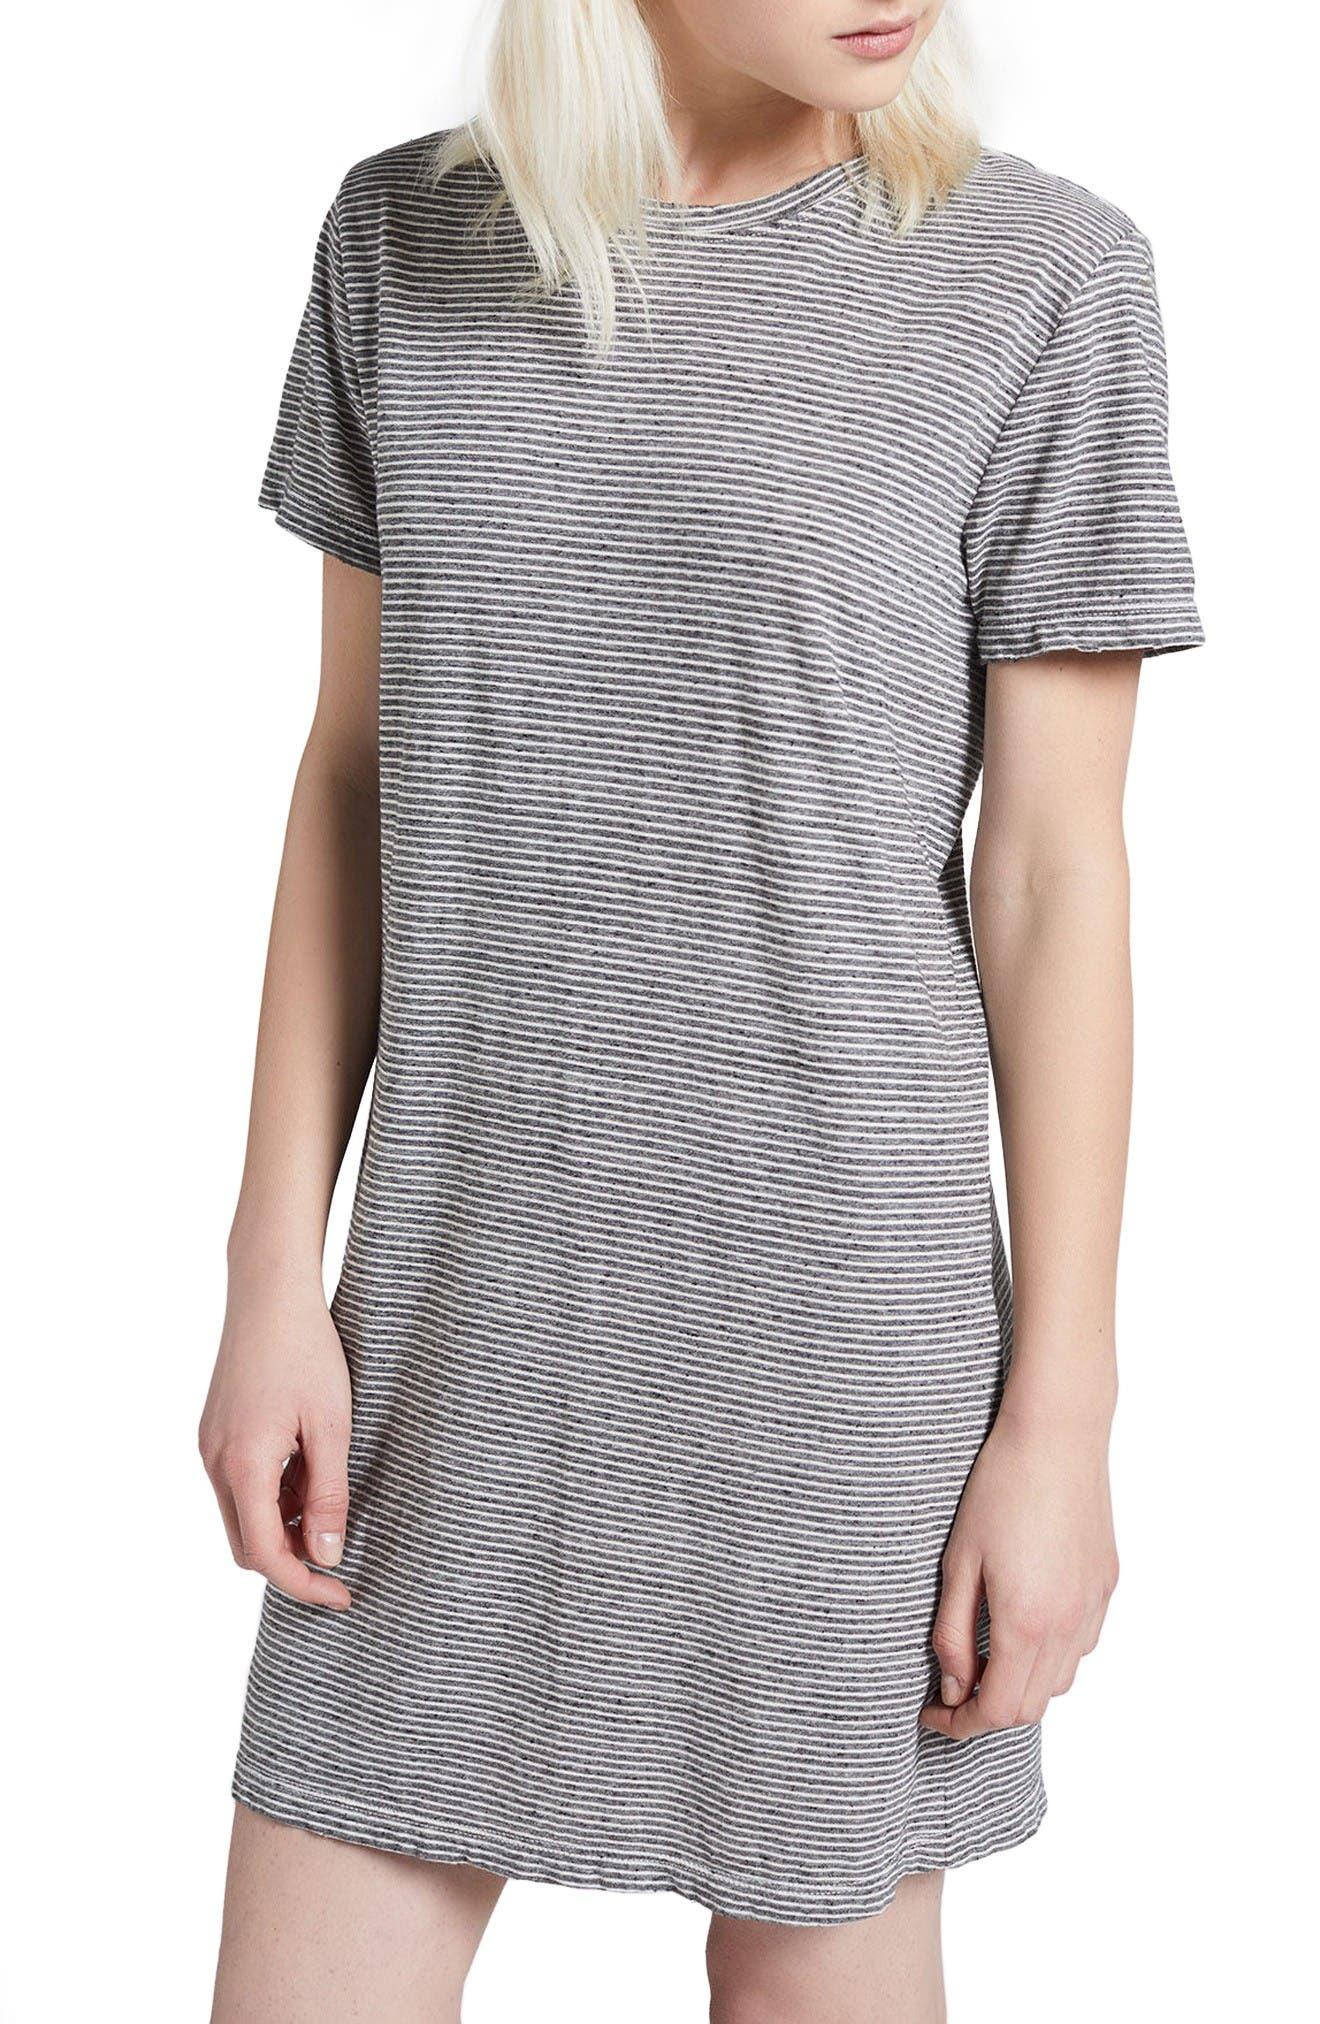 Alternate Image 1 Selected - Current/Elliott The Beatnik T-Shirt Dress